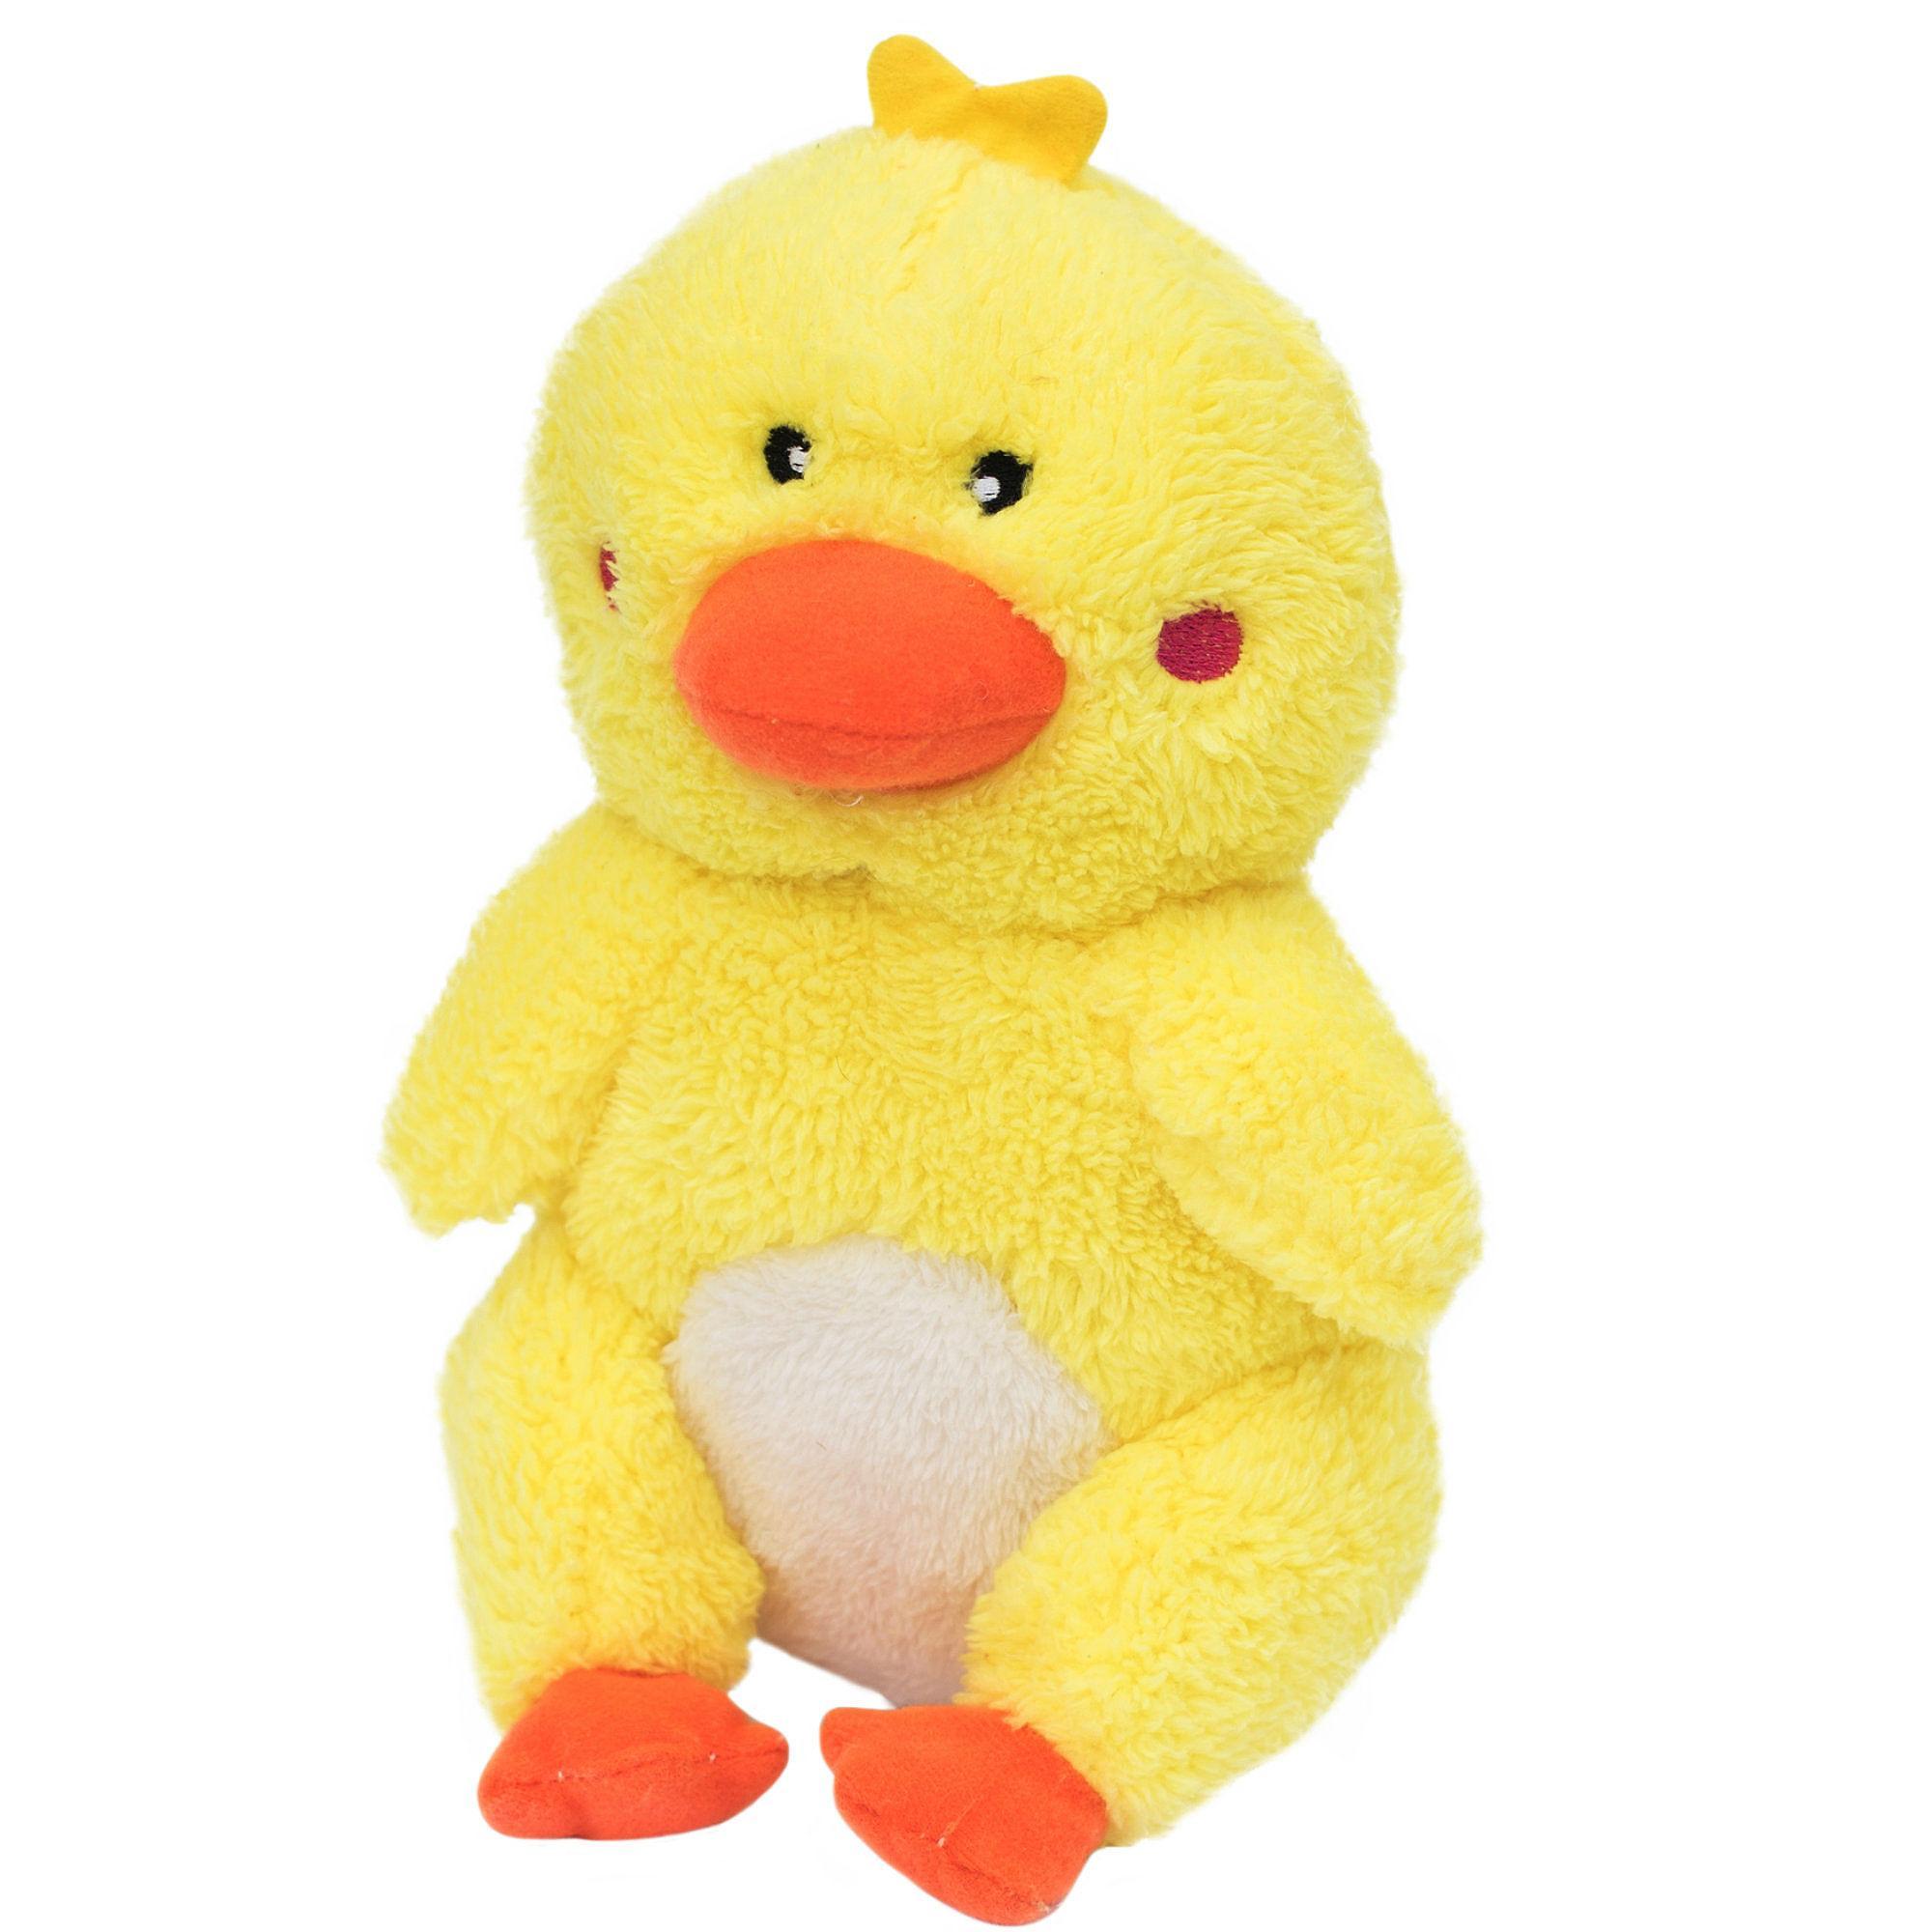 ZippyPaws Cheeky Chumz Dog Toy - Duck